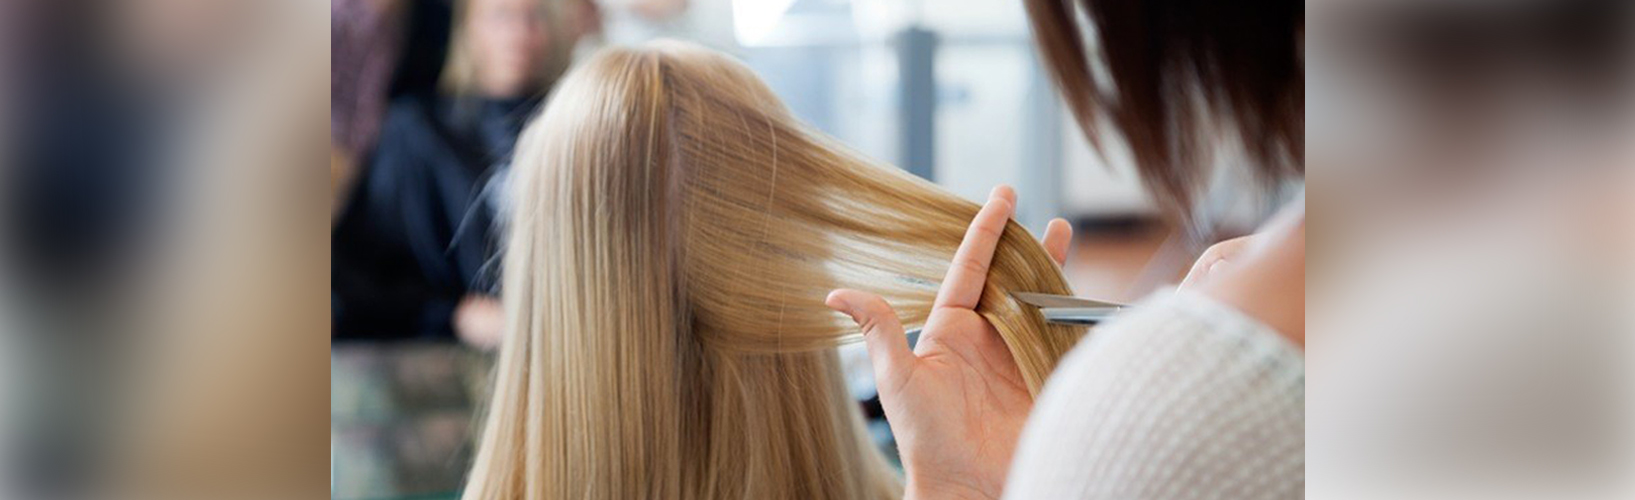 4.-Haircutting